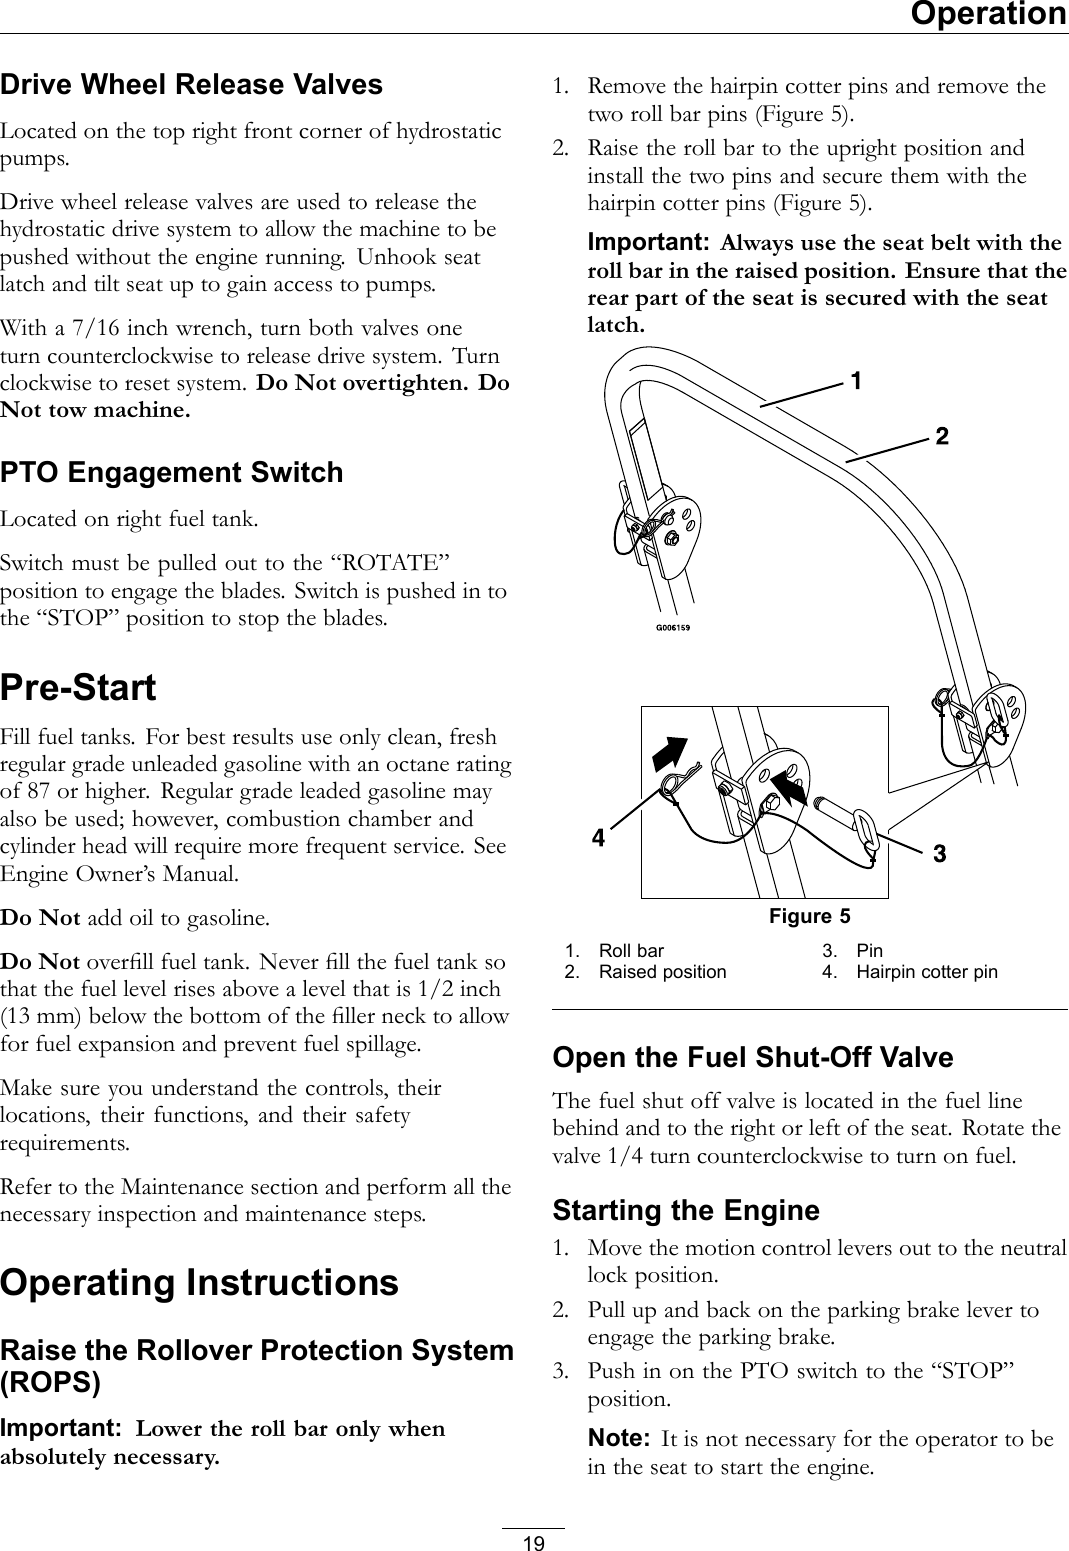 Exmark Lz27Kc604 Users Manual